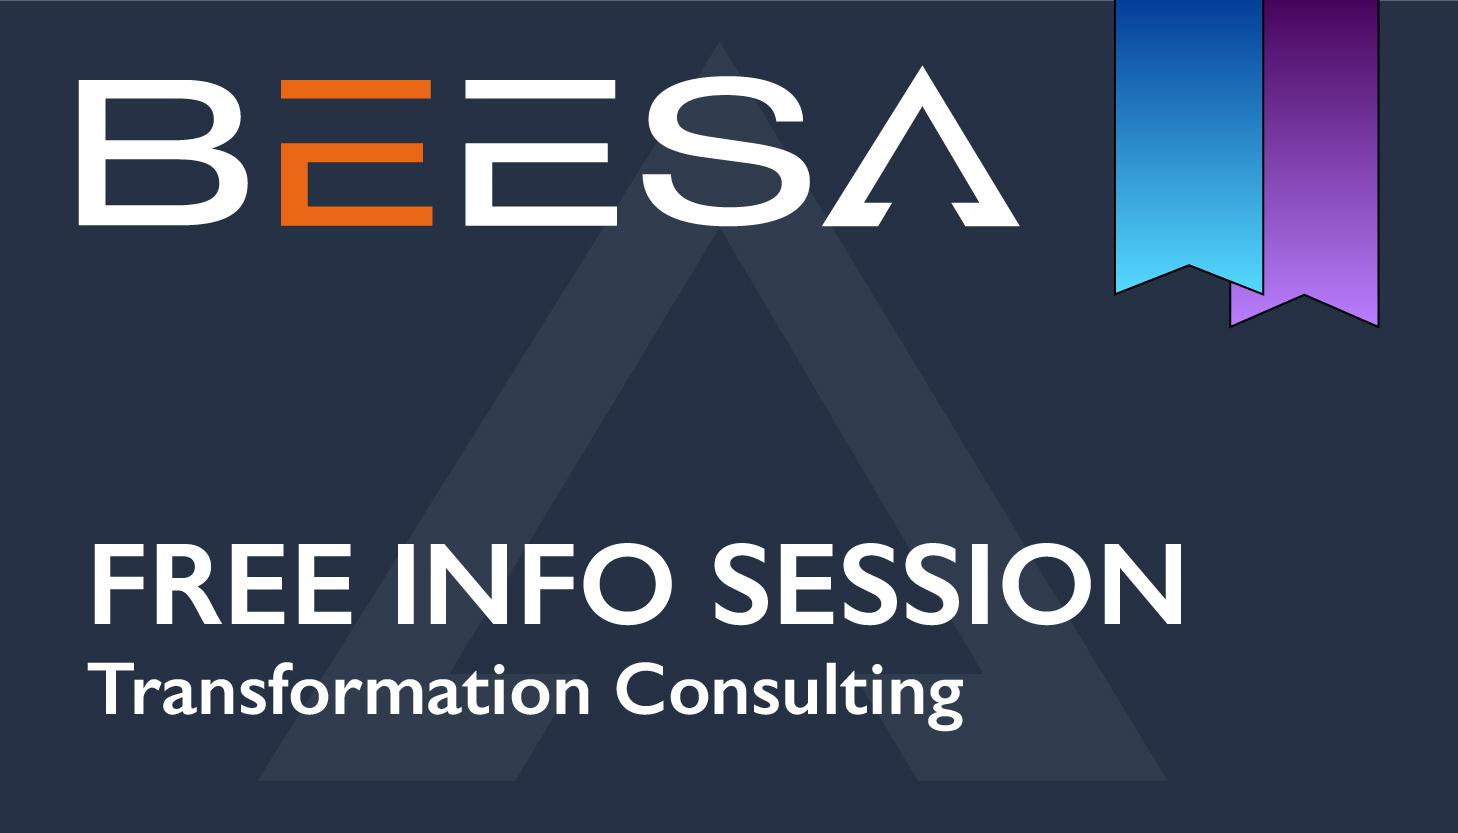 BEESA Free Info Session ISBEE-01